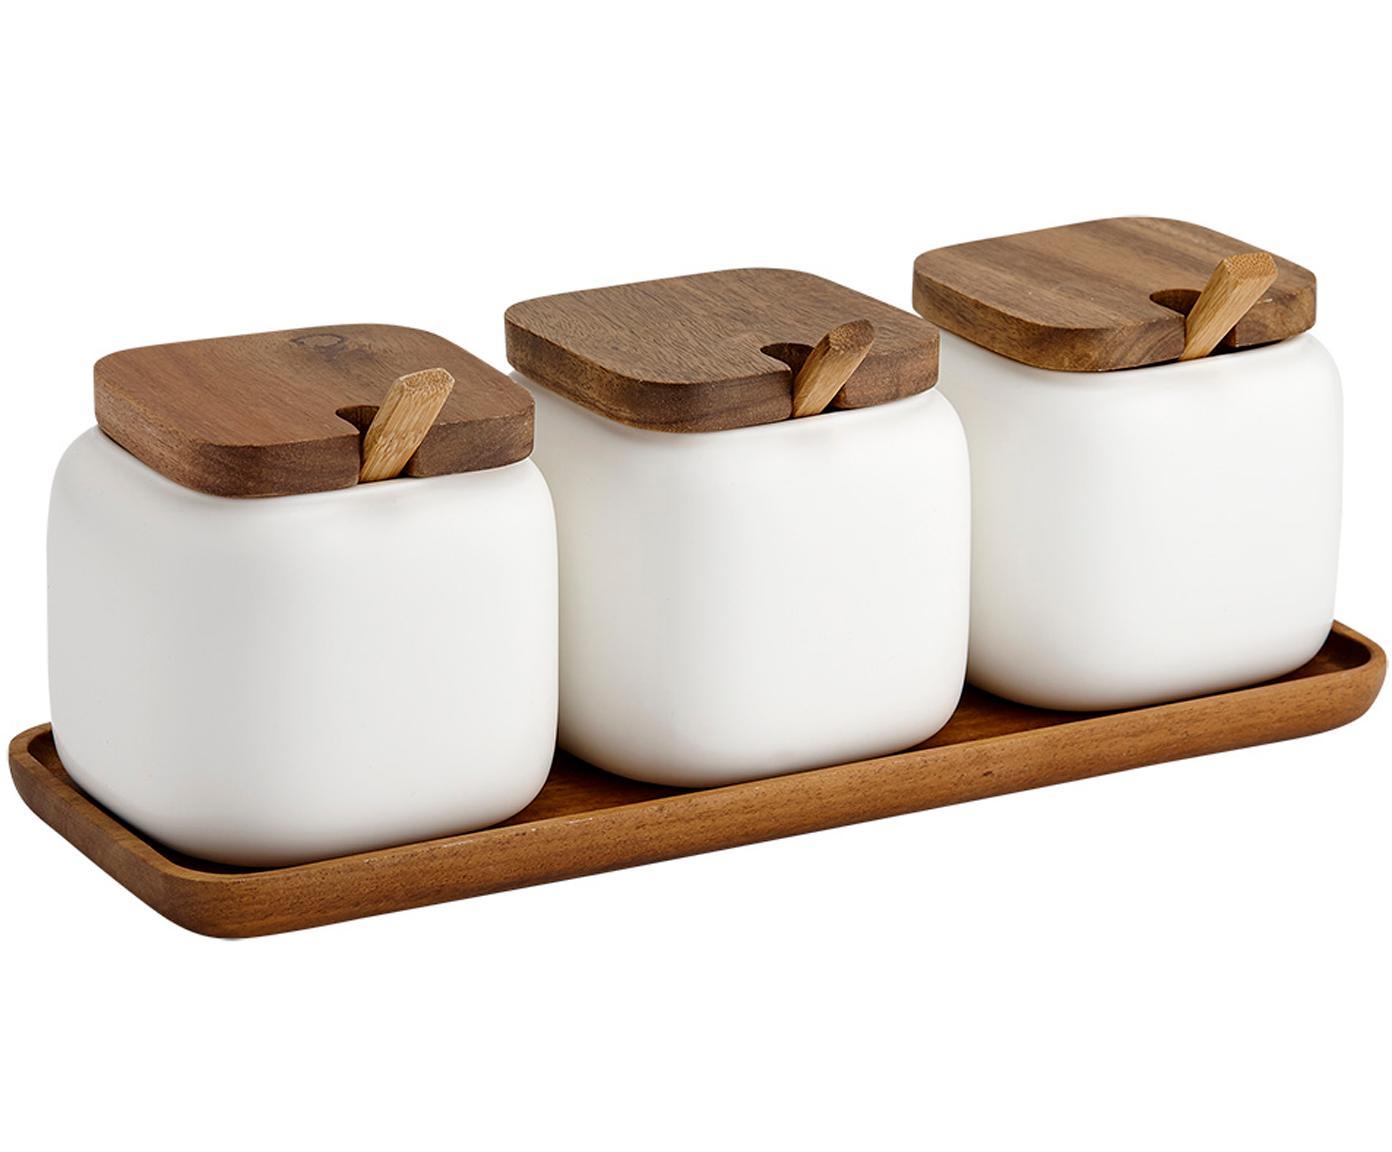 Opbergpottenset Essentials van porselein en acaciahout, 7-delig, Porselein, acaciahout, Wit, acaciahoutkleurig, 28 x 10 cm